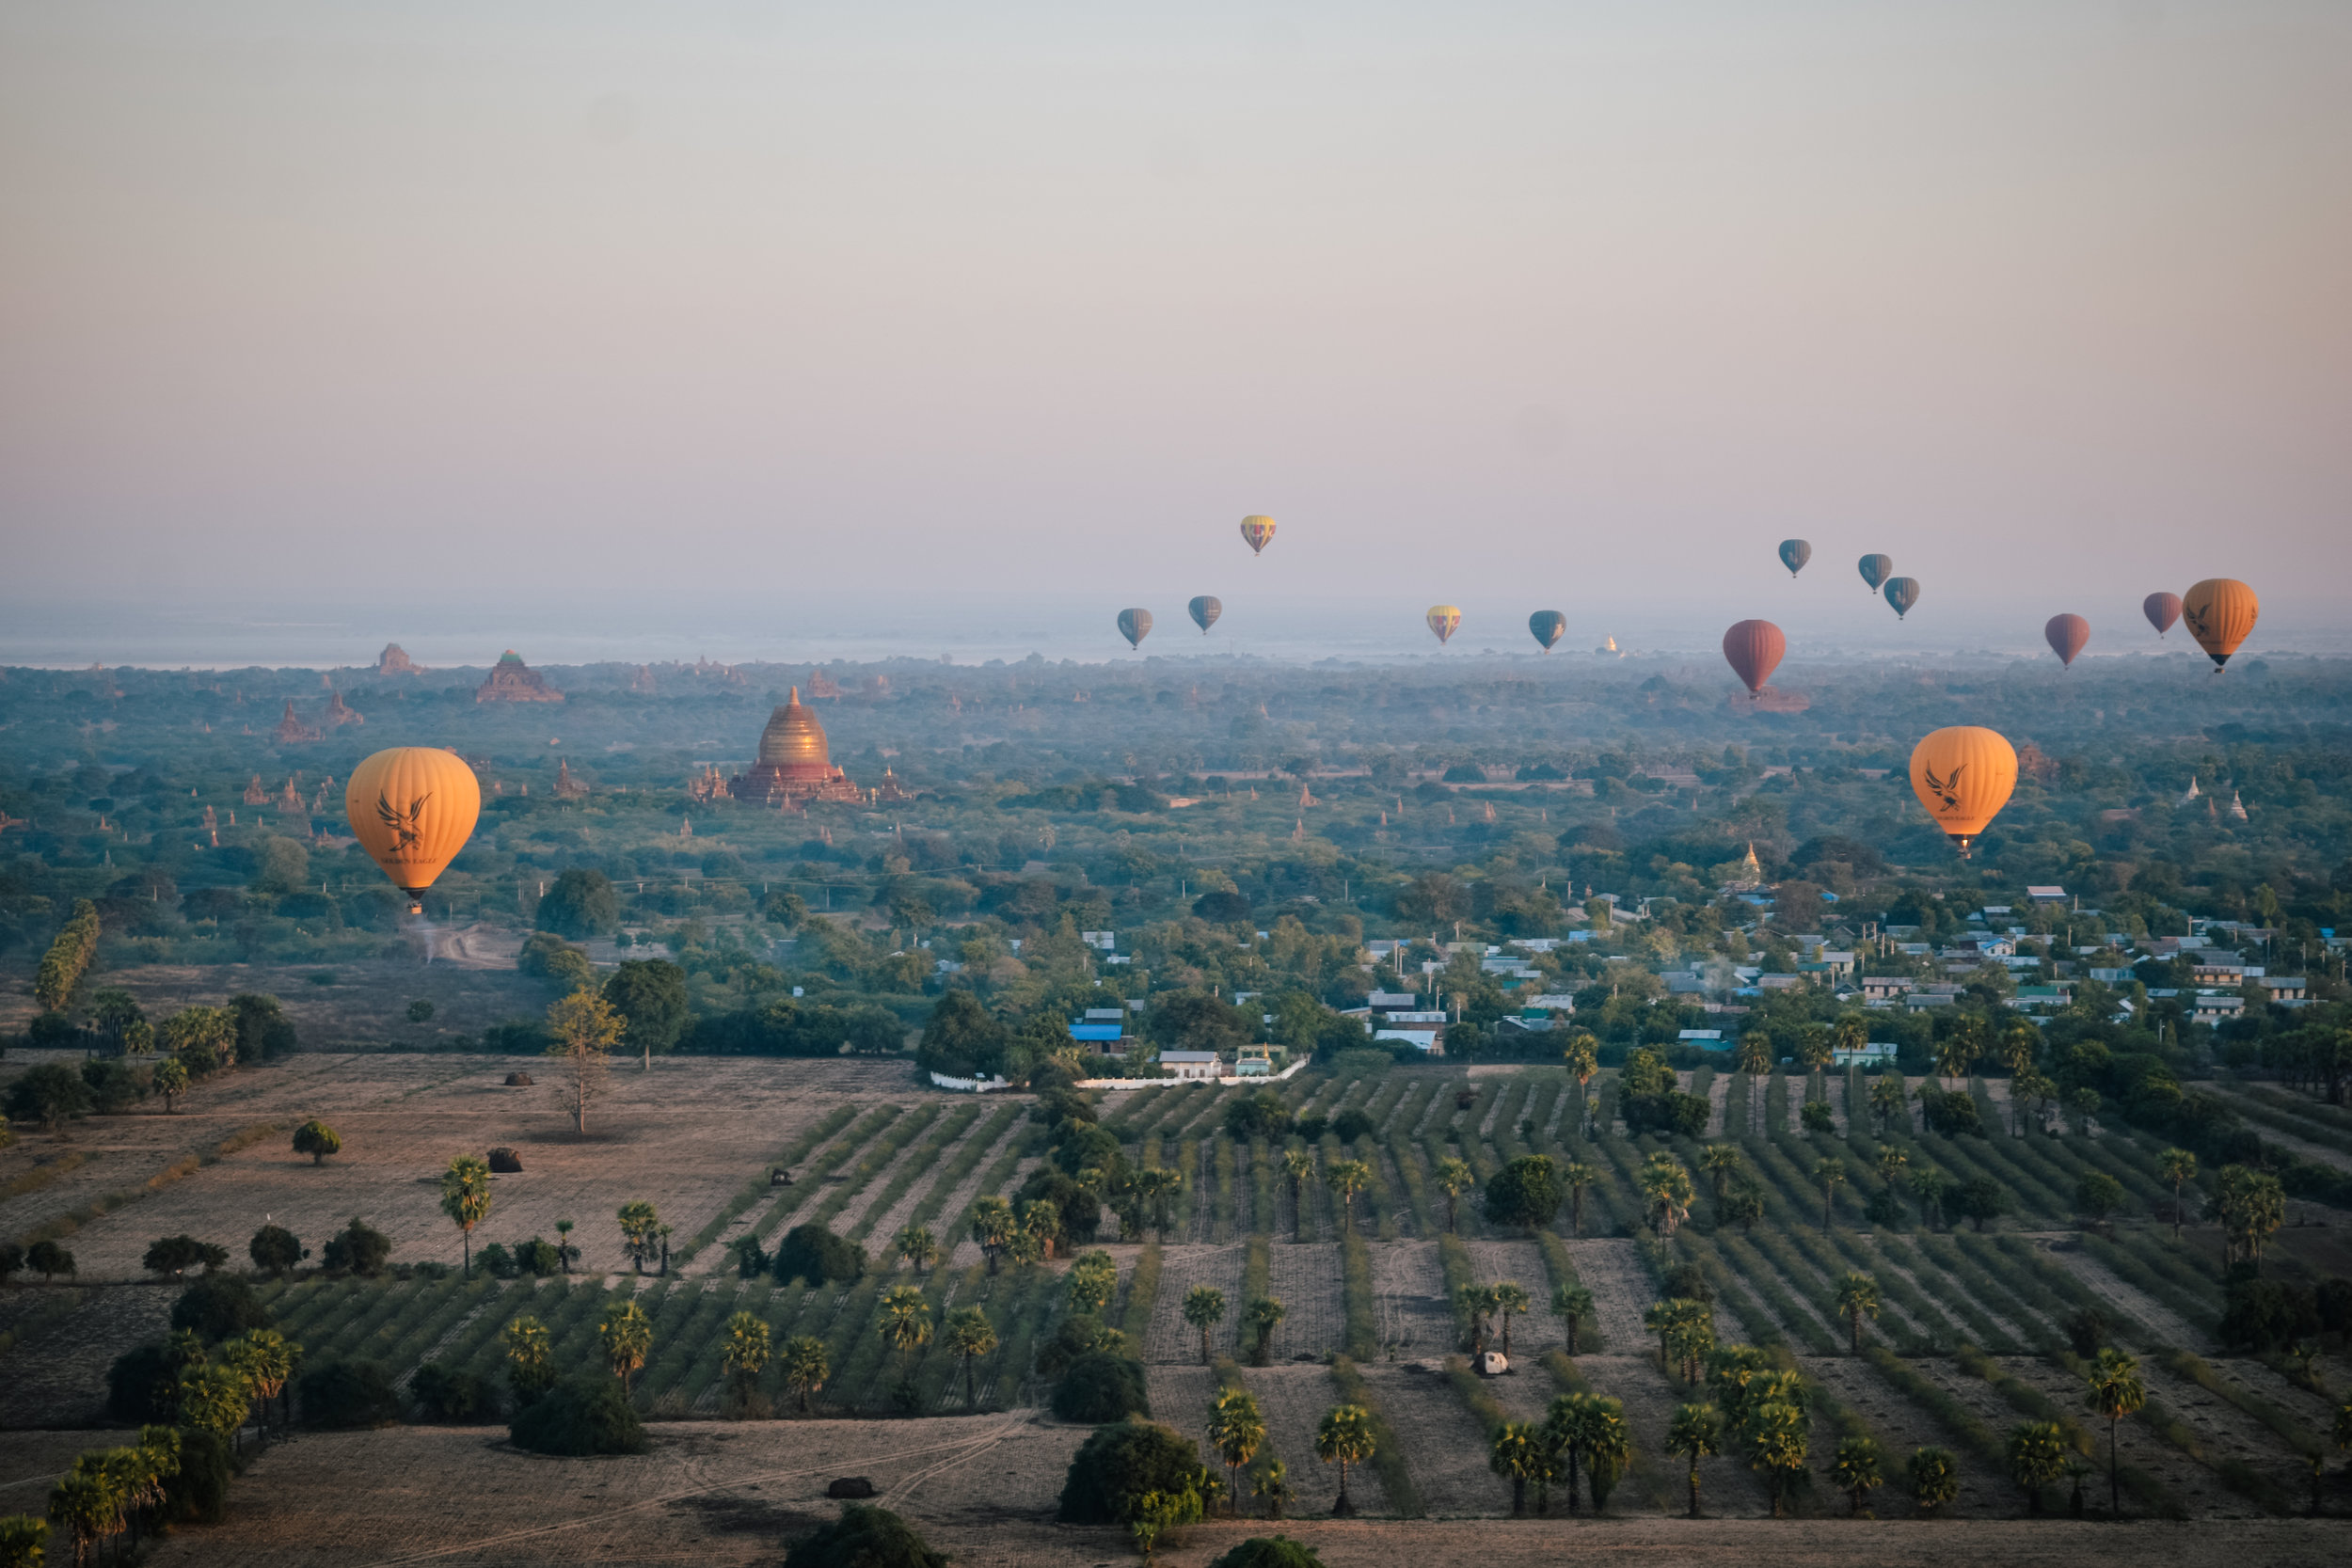 Temples and balloons in Bagan, Myanmar